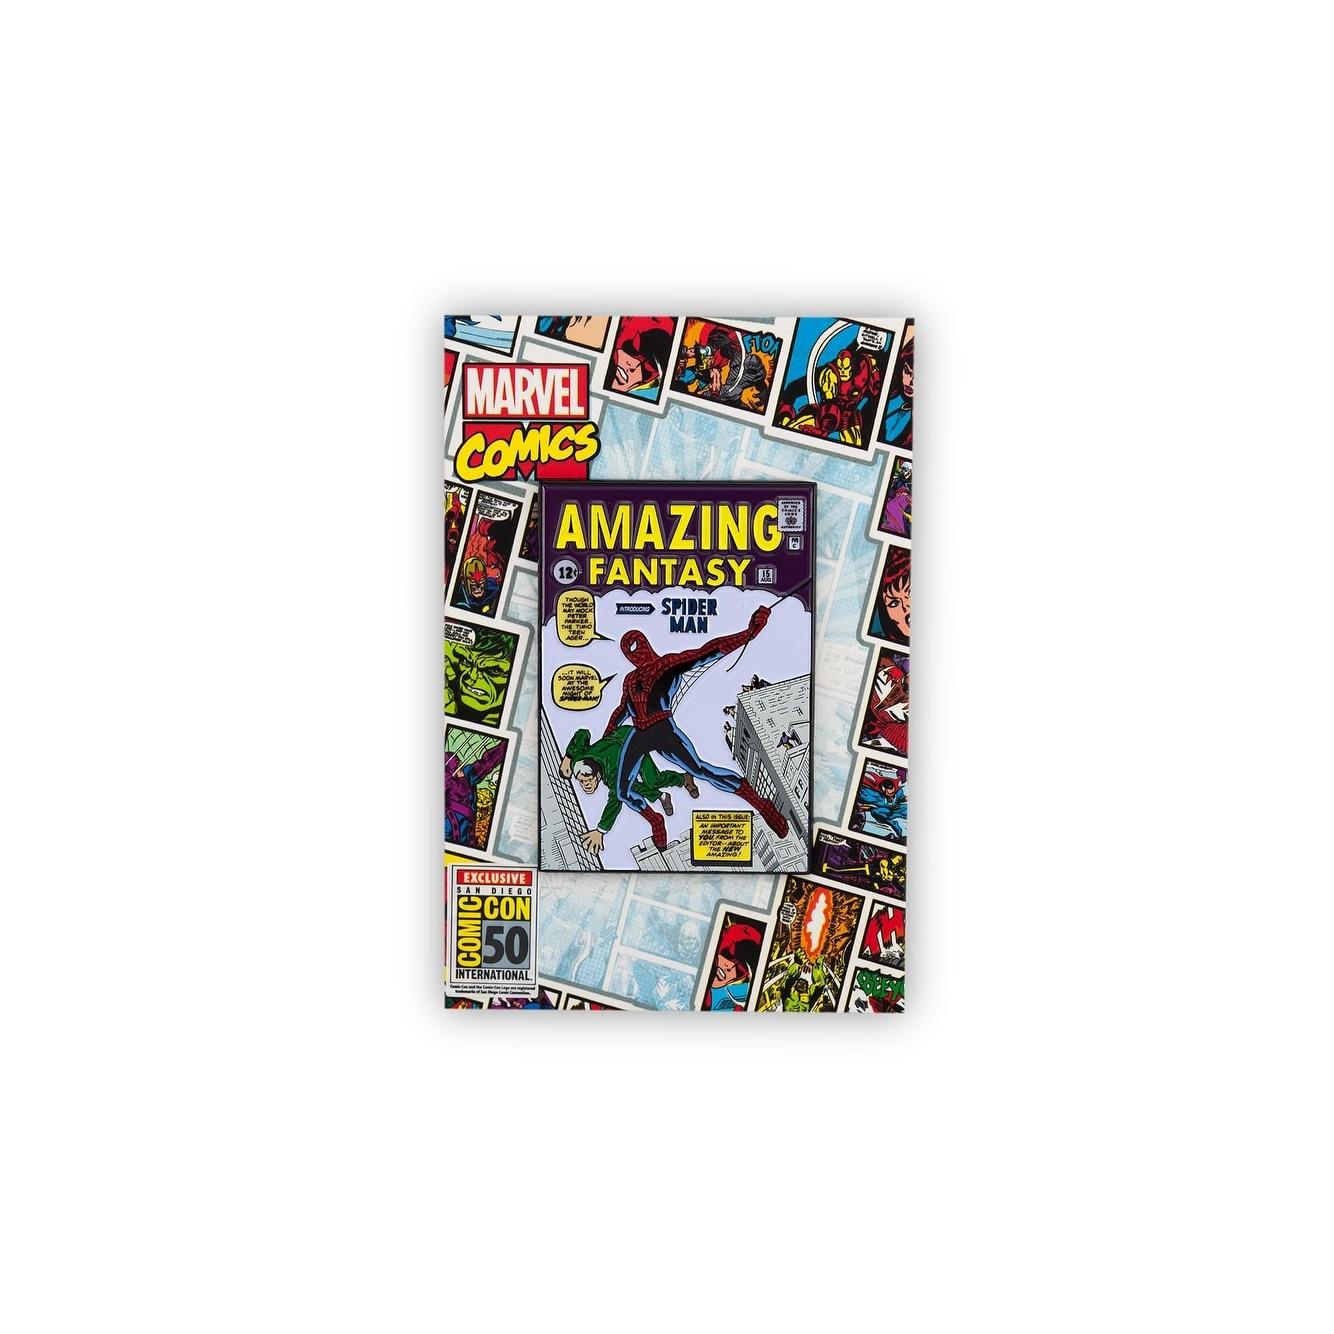 Marvel Comics Spider Man Comic Pin | Exclusive Oversize Enamel Spider Man Pin Multi Colored